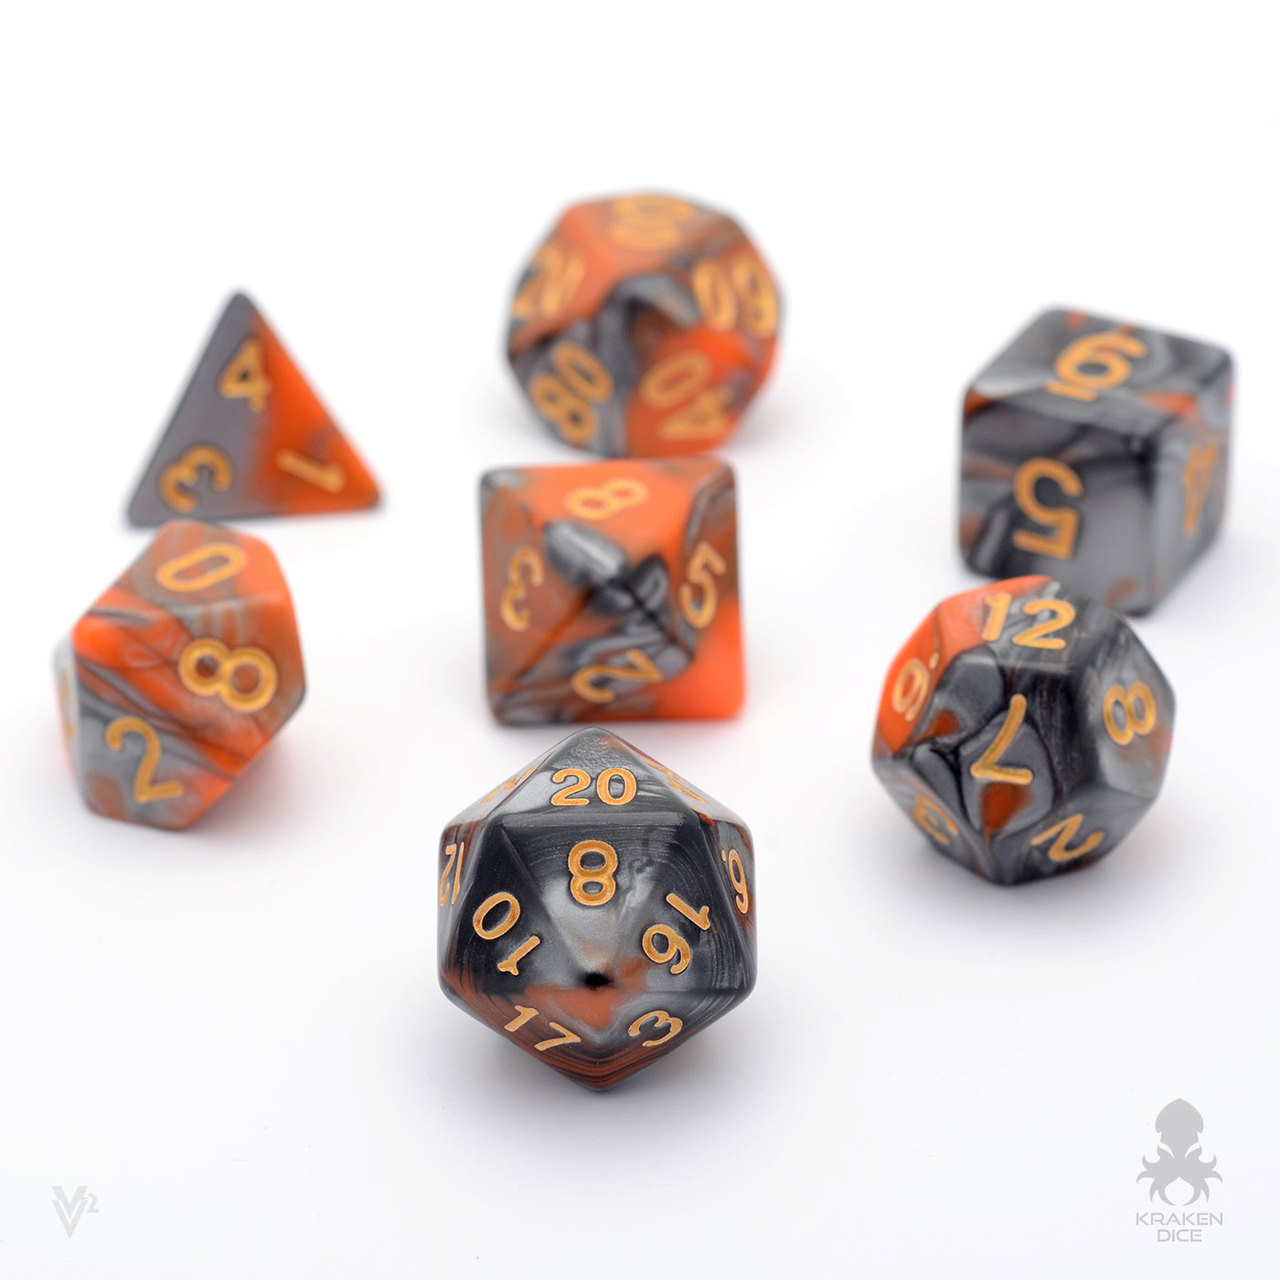 Metallic Dice 16mm Glow In The Dark Orange Dice Set DnD Rpg